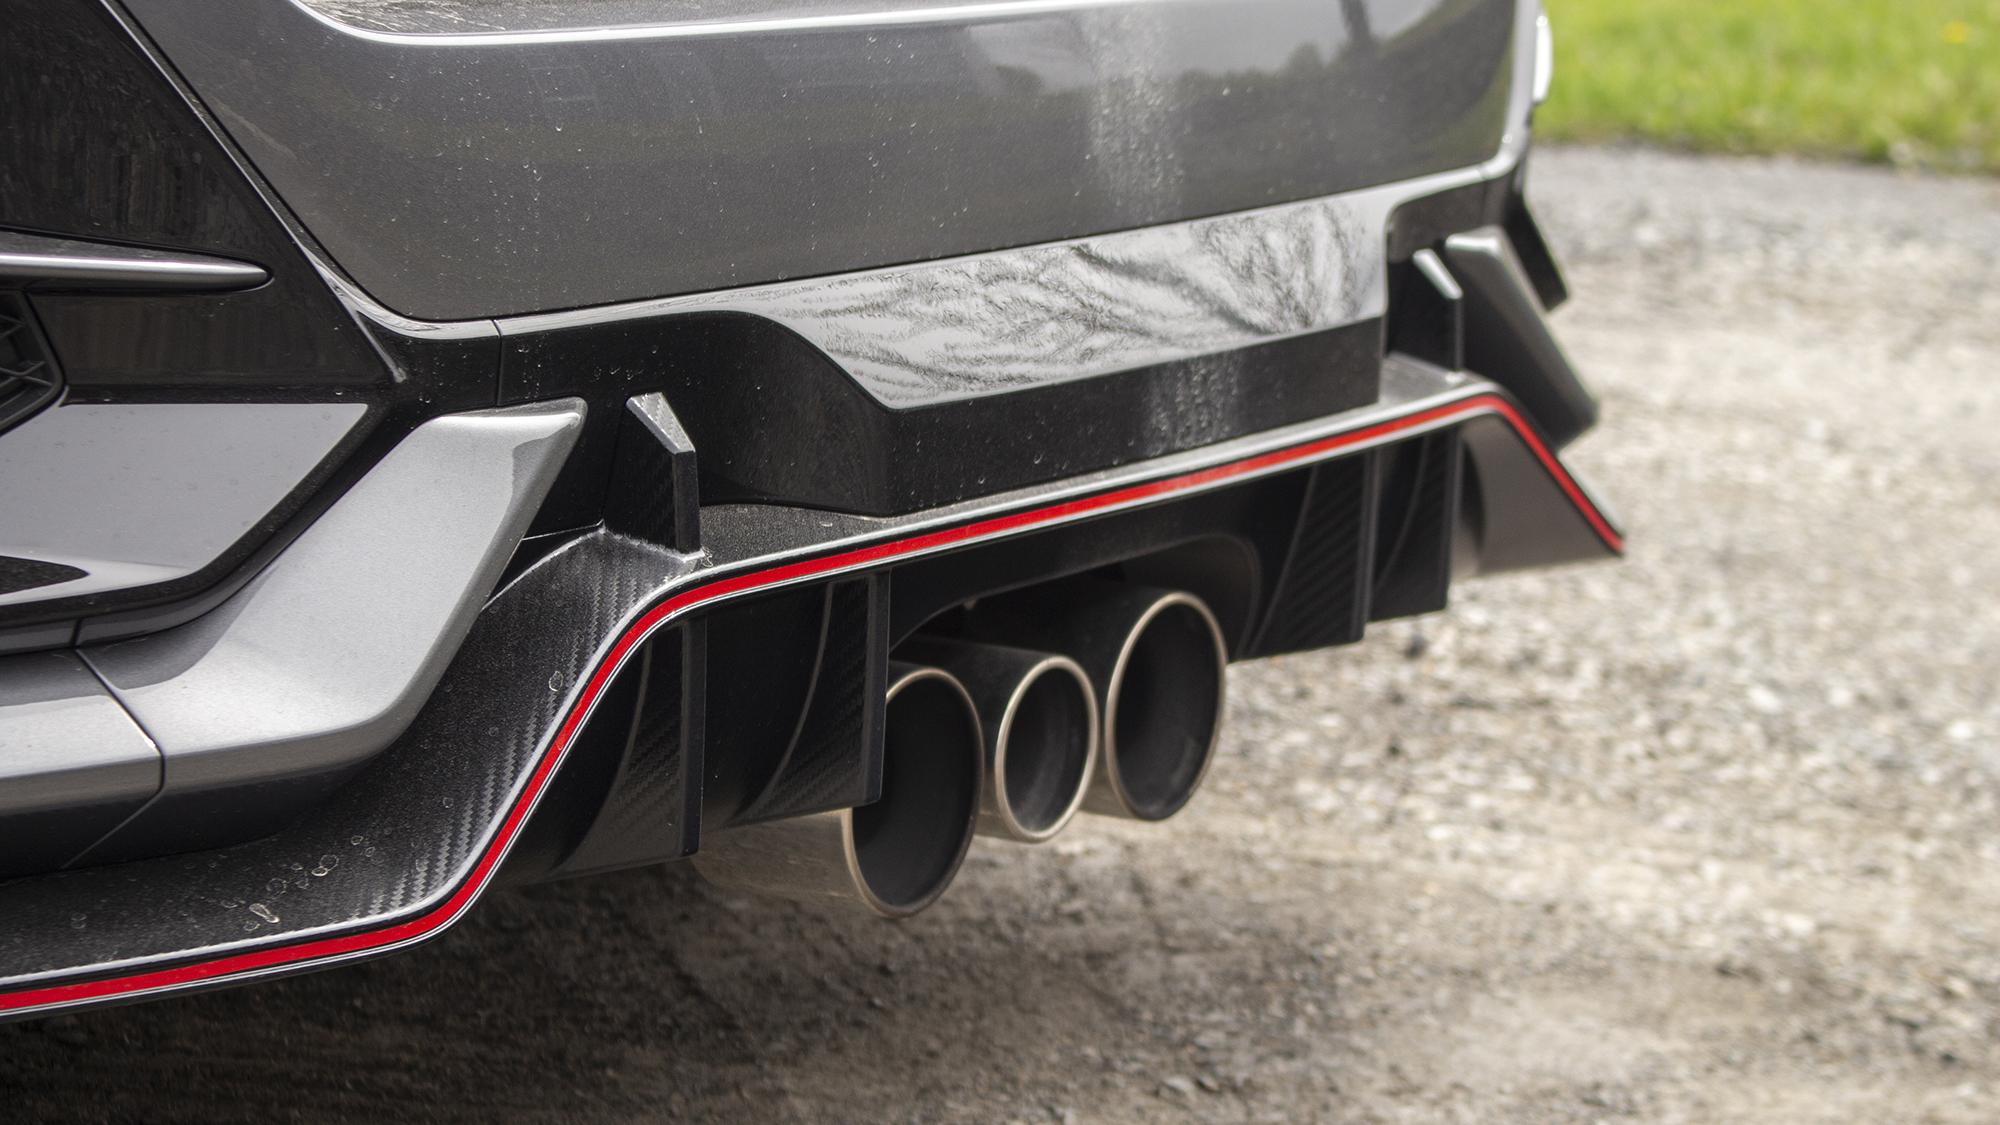 2021 Honda Civic Type R exhaust